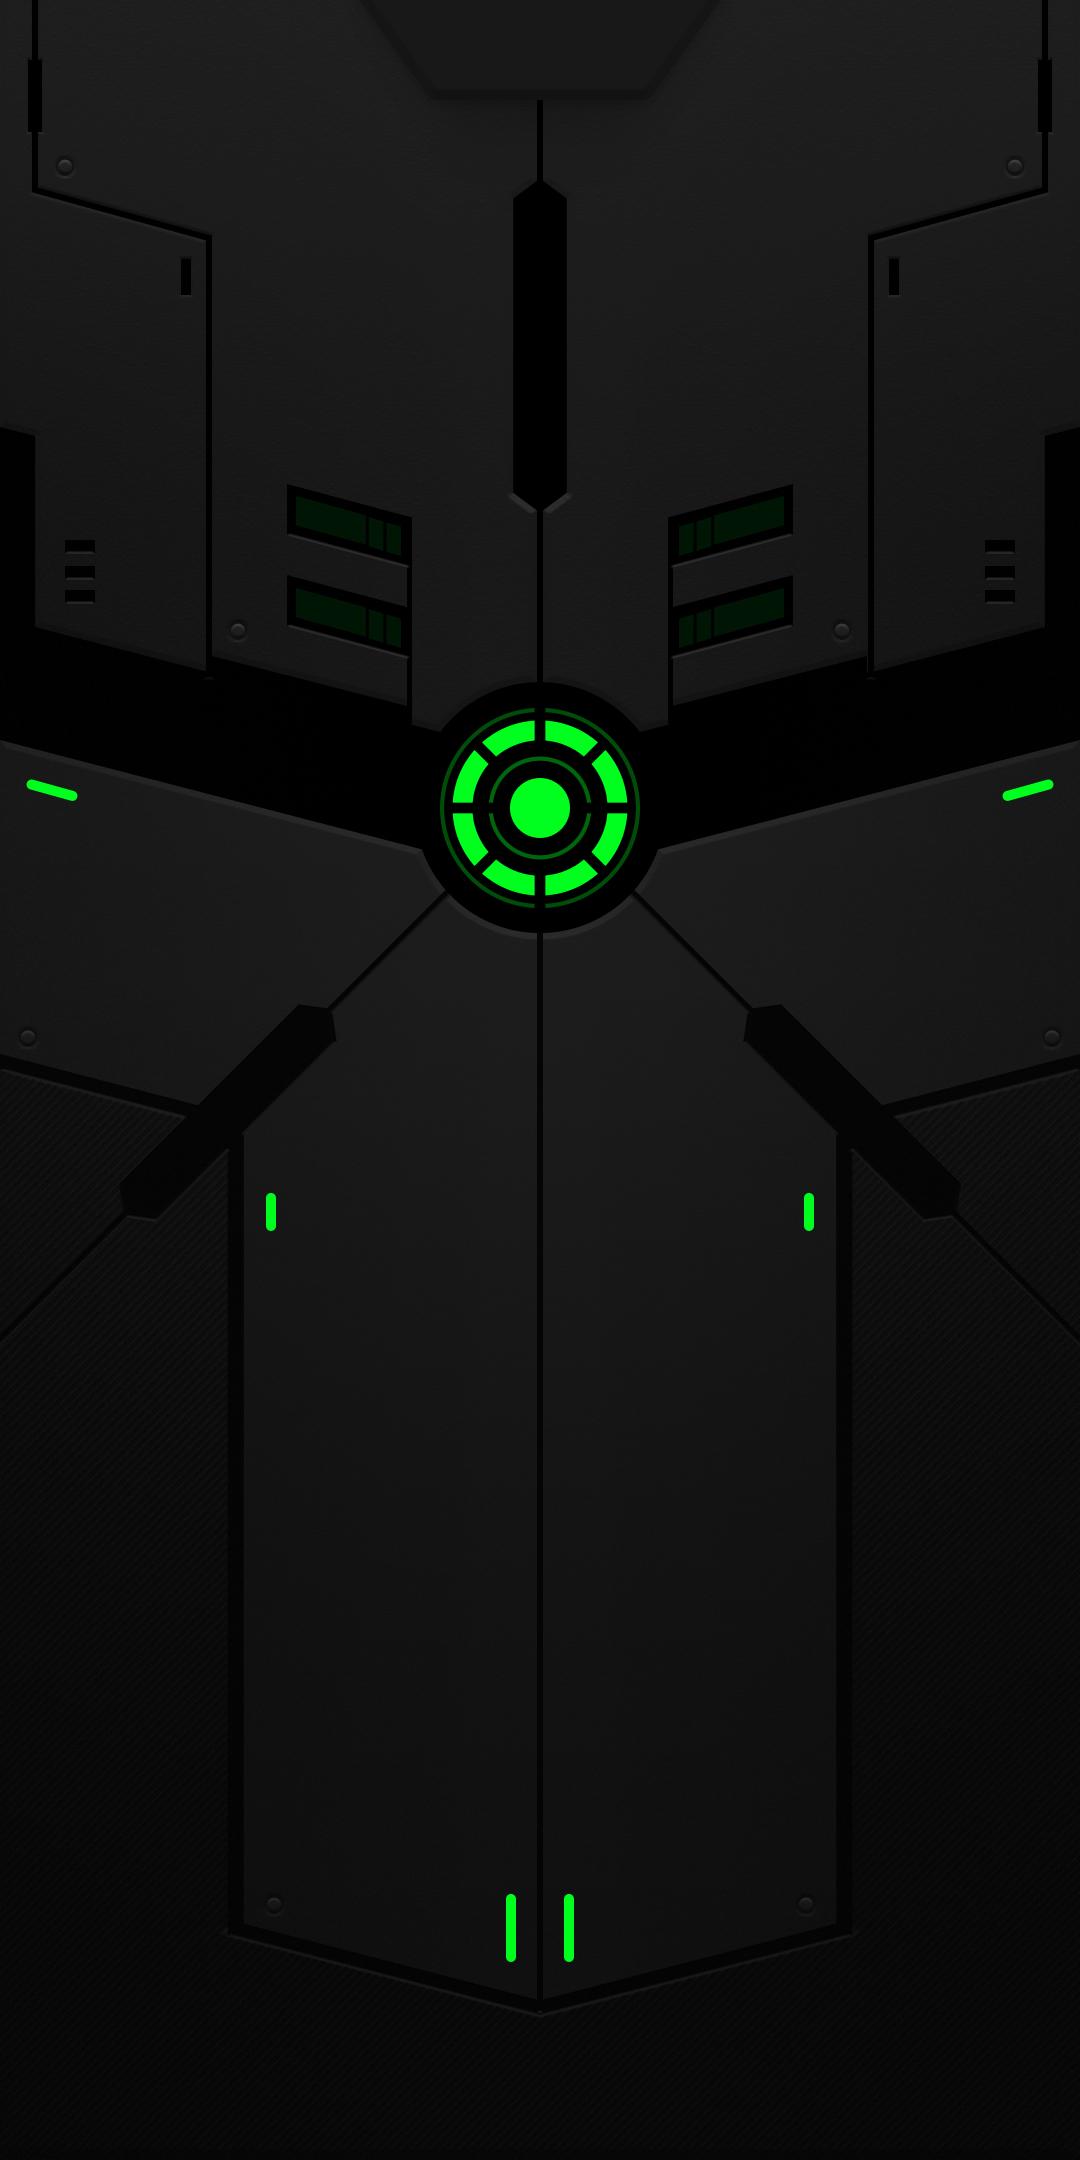 xiaomi_black_shark_helo_wall_droidviews_04.jpg